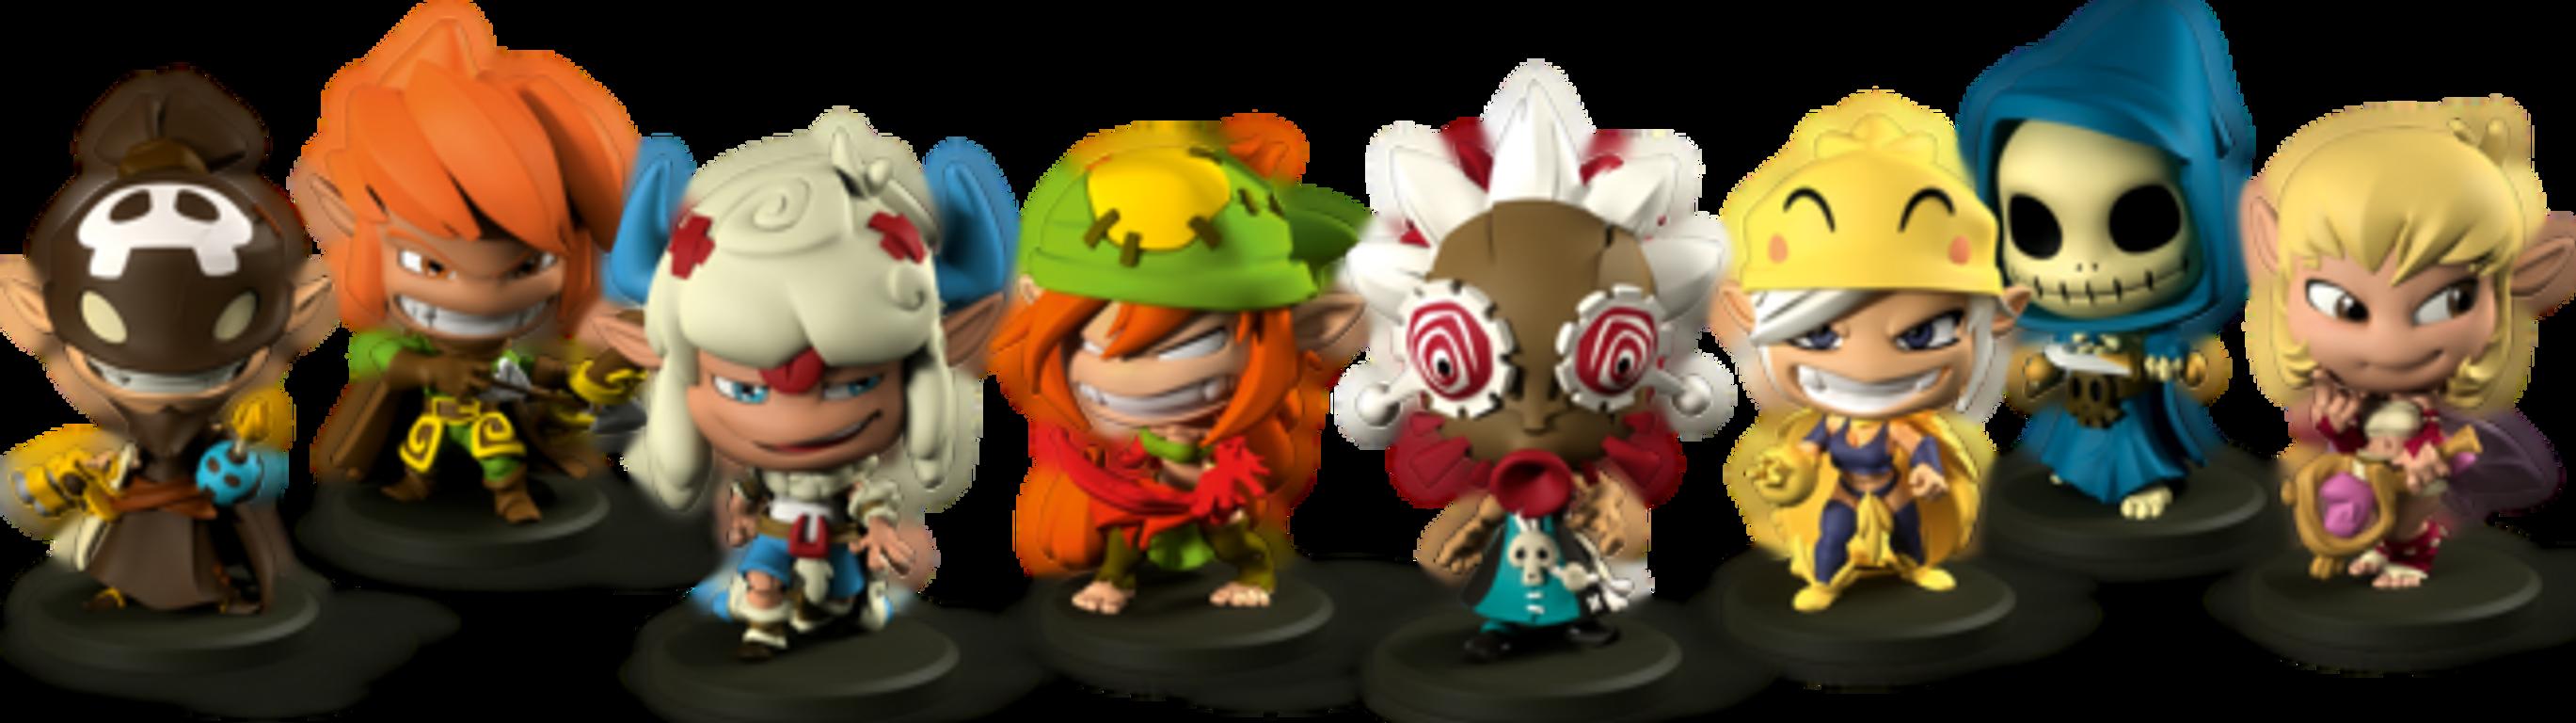 Krosmaster: Arena miniatures